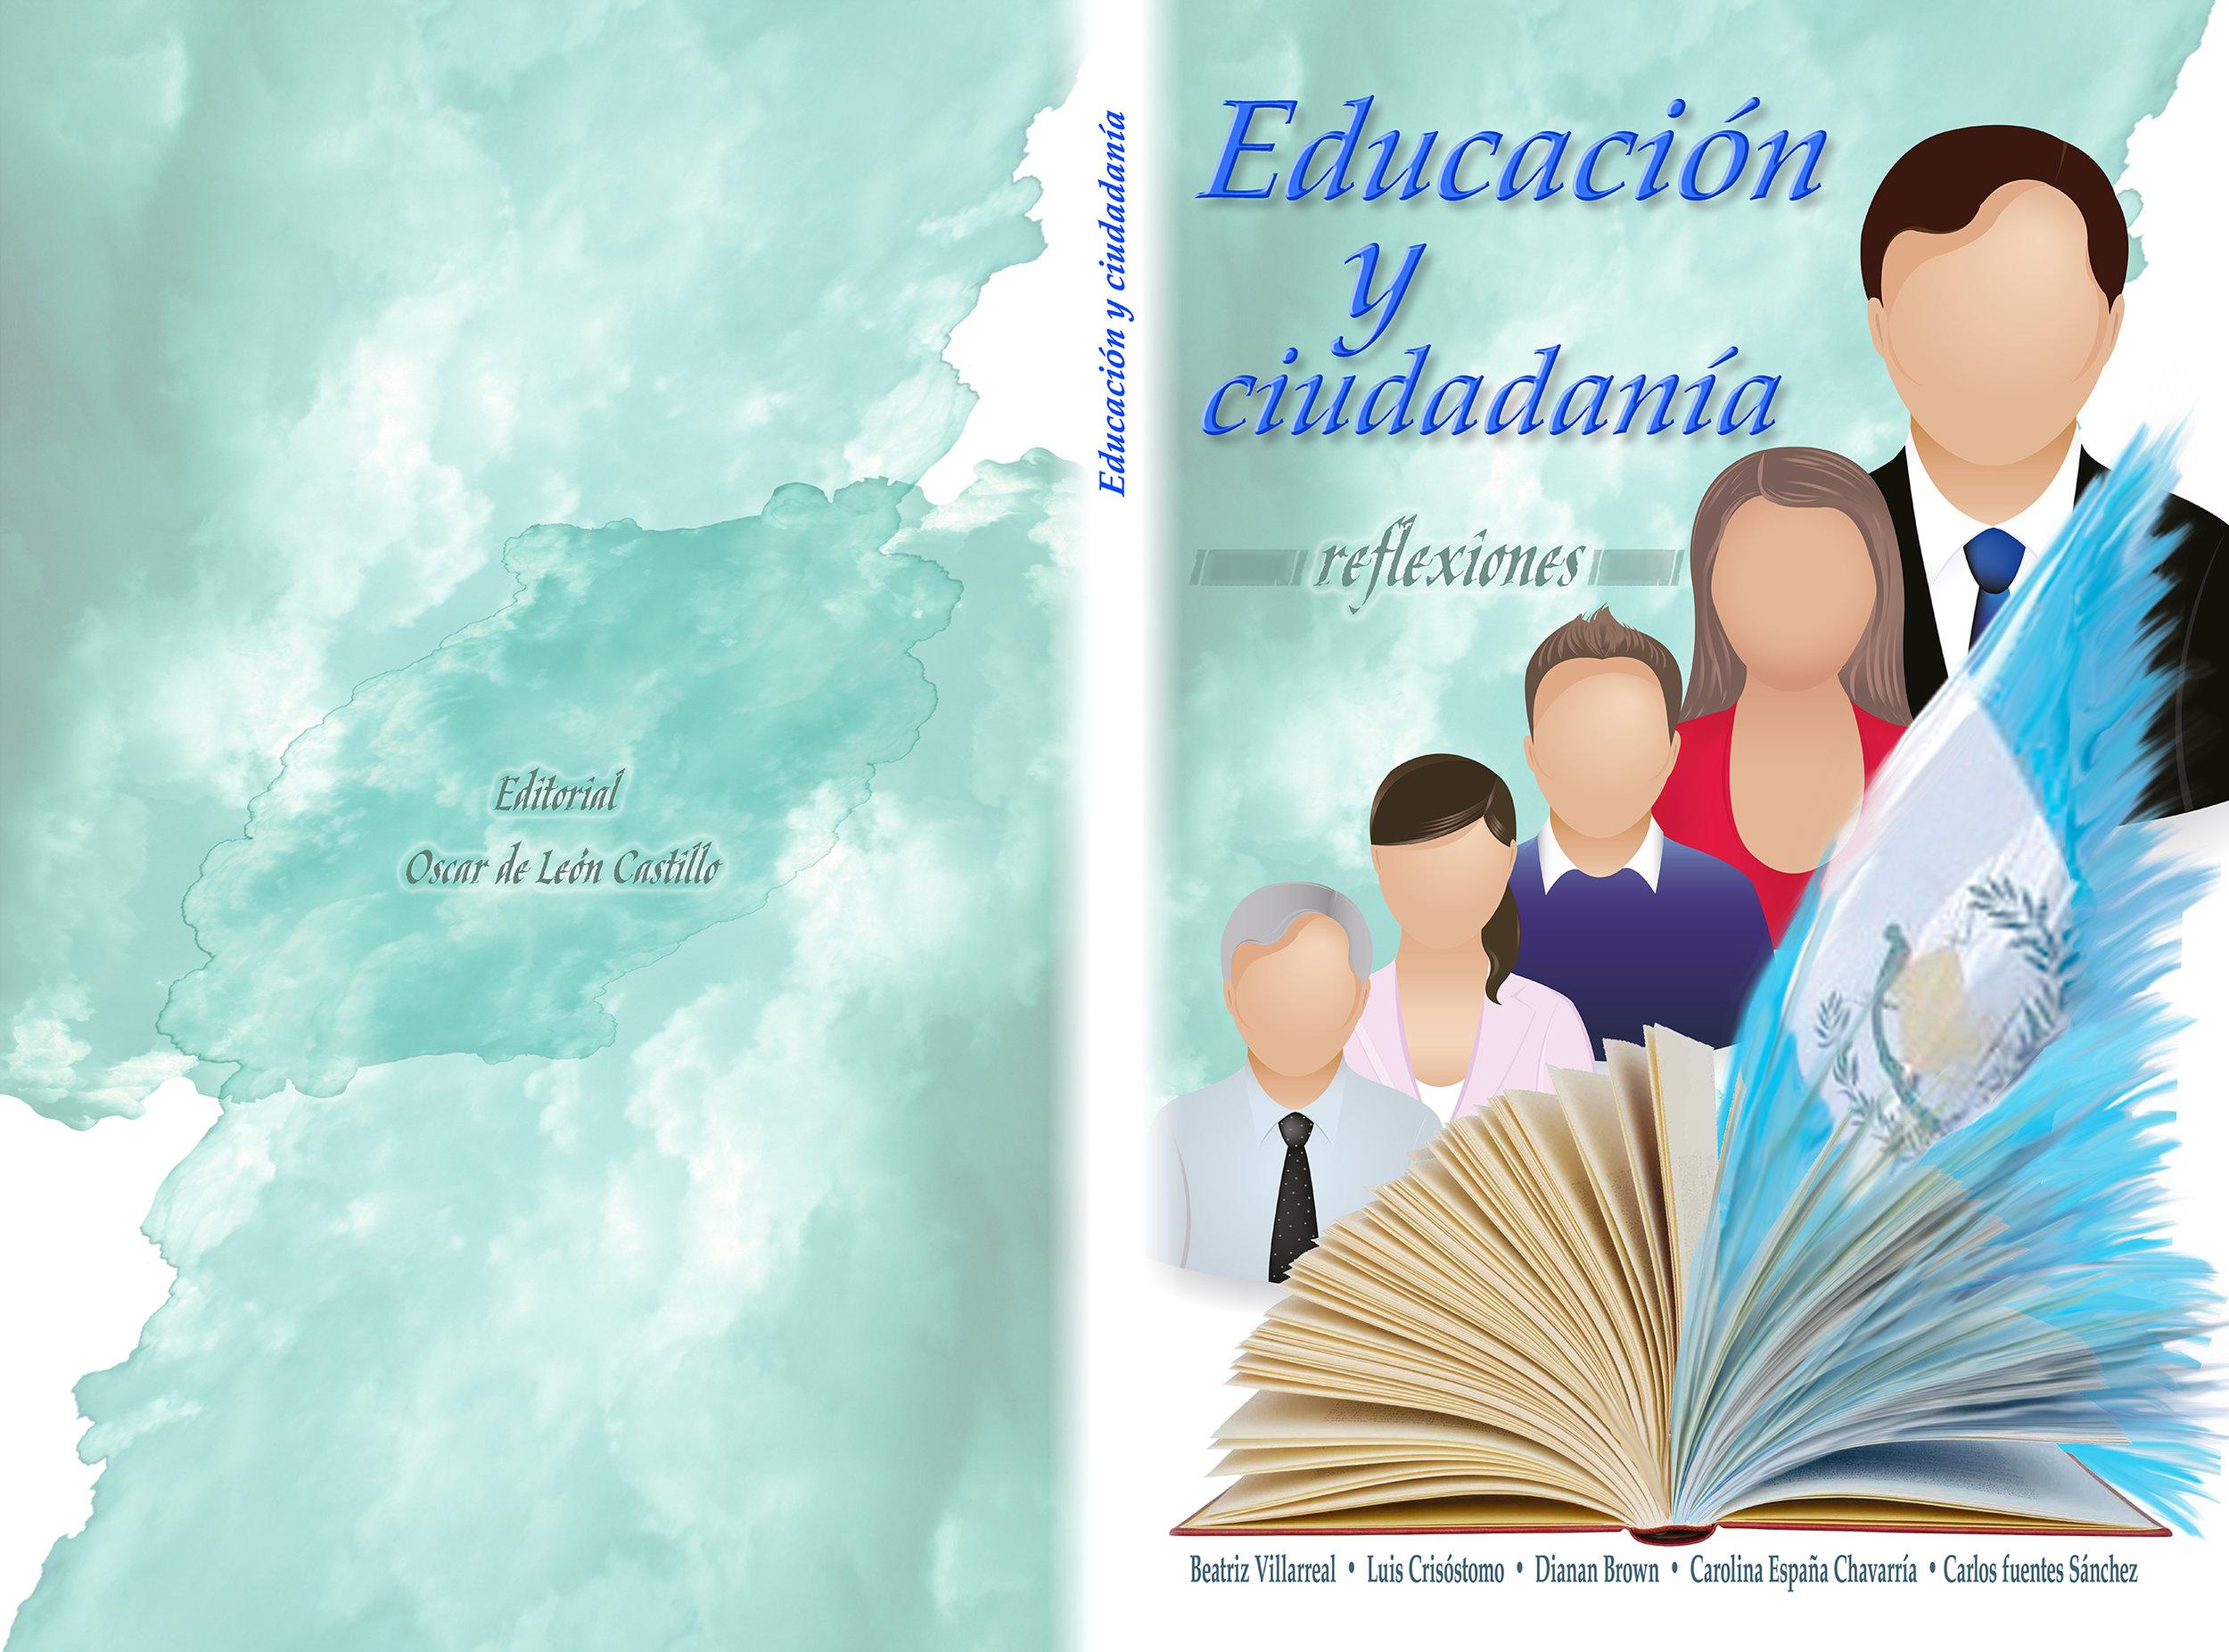 Portada Educacioìn Ciudadania completa (1).jpg